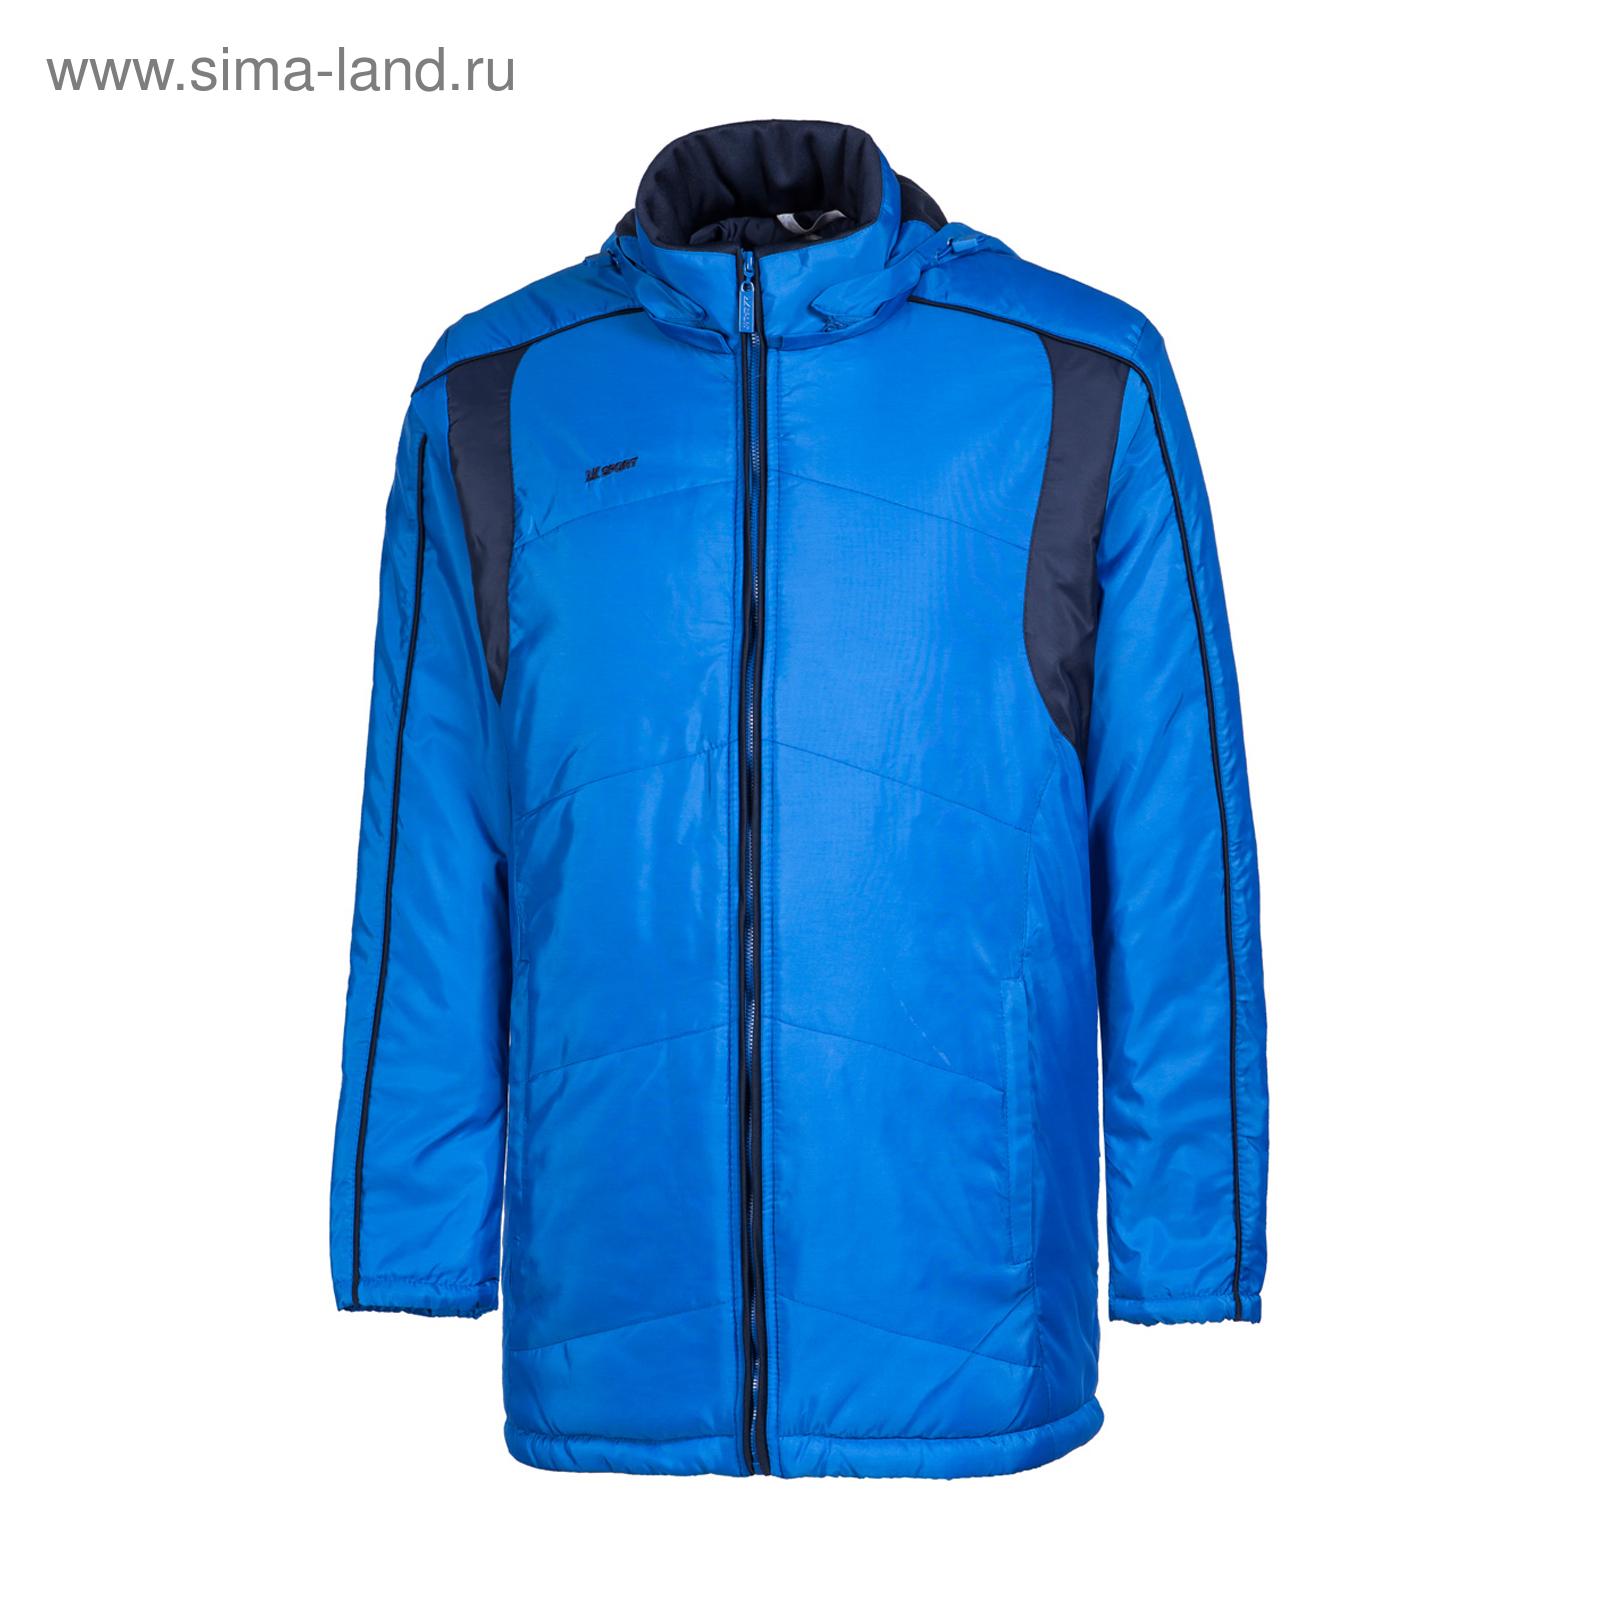 587fed73d8f3 Куртка утепленная 2K Sport Vettore, royal/navy, L (3446486) - Купить ...